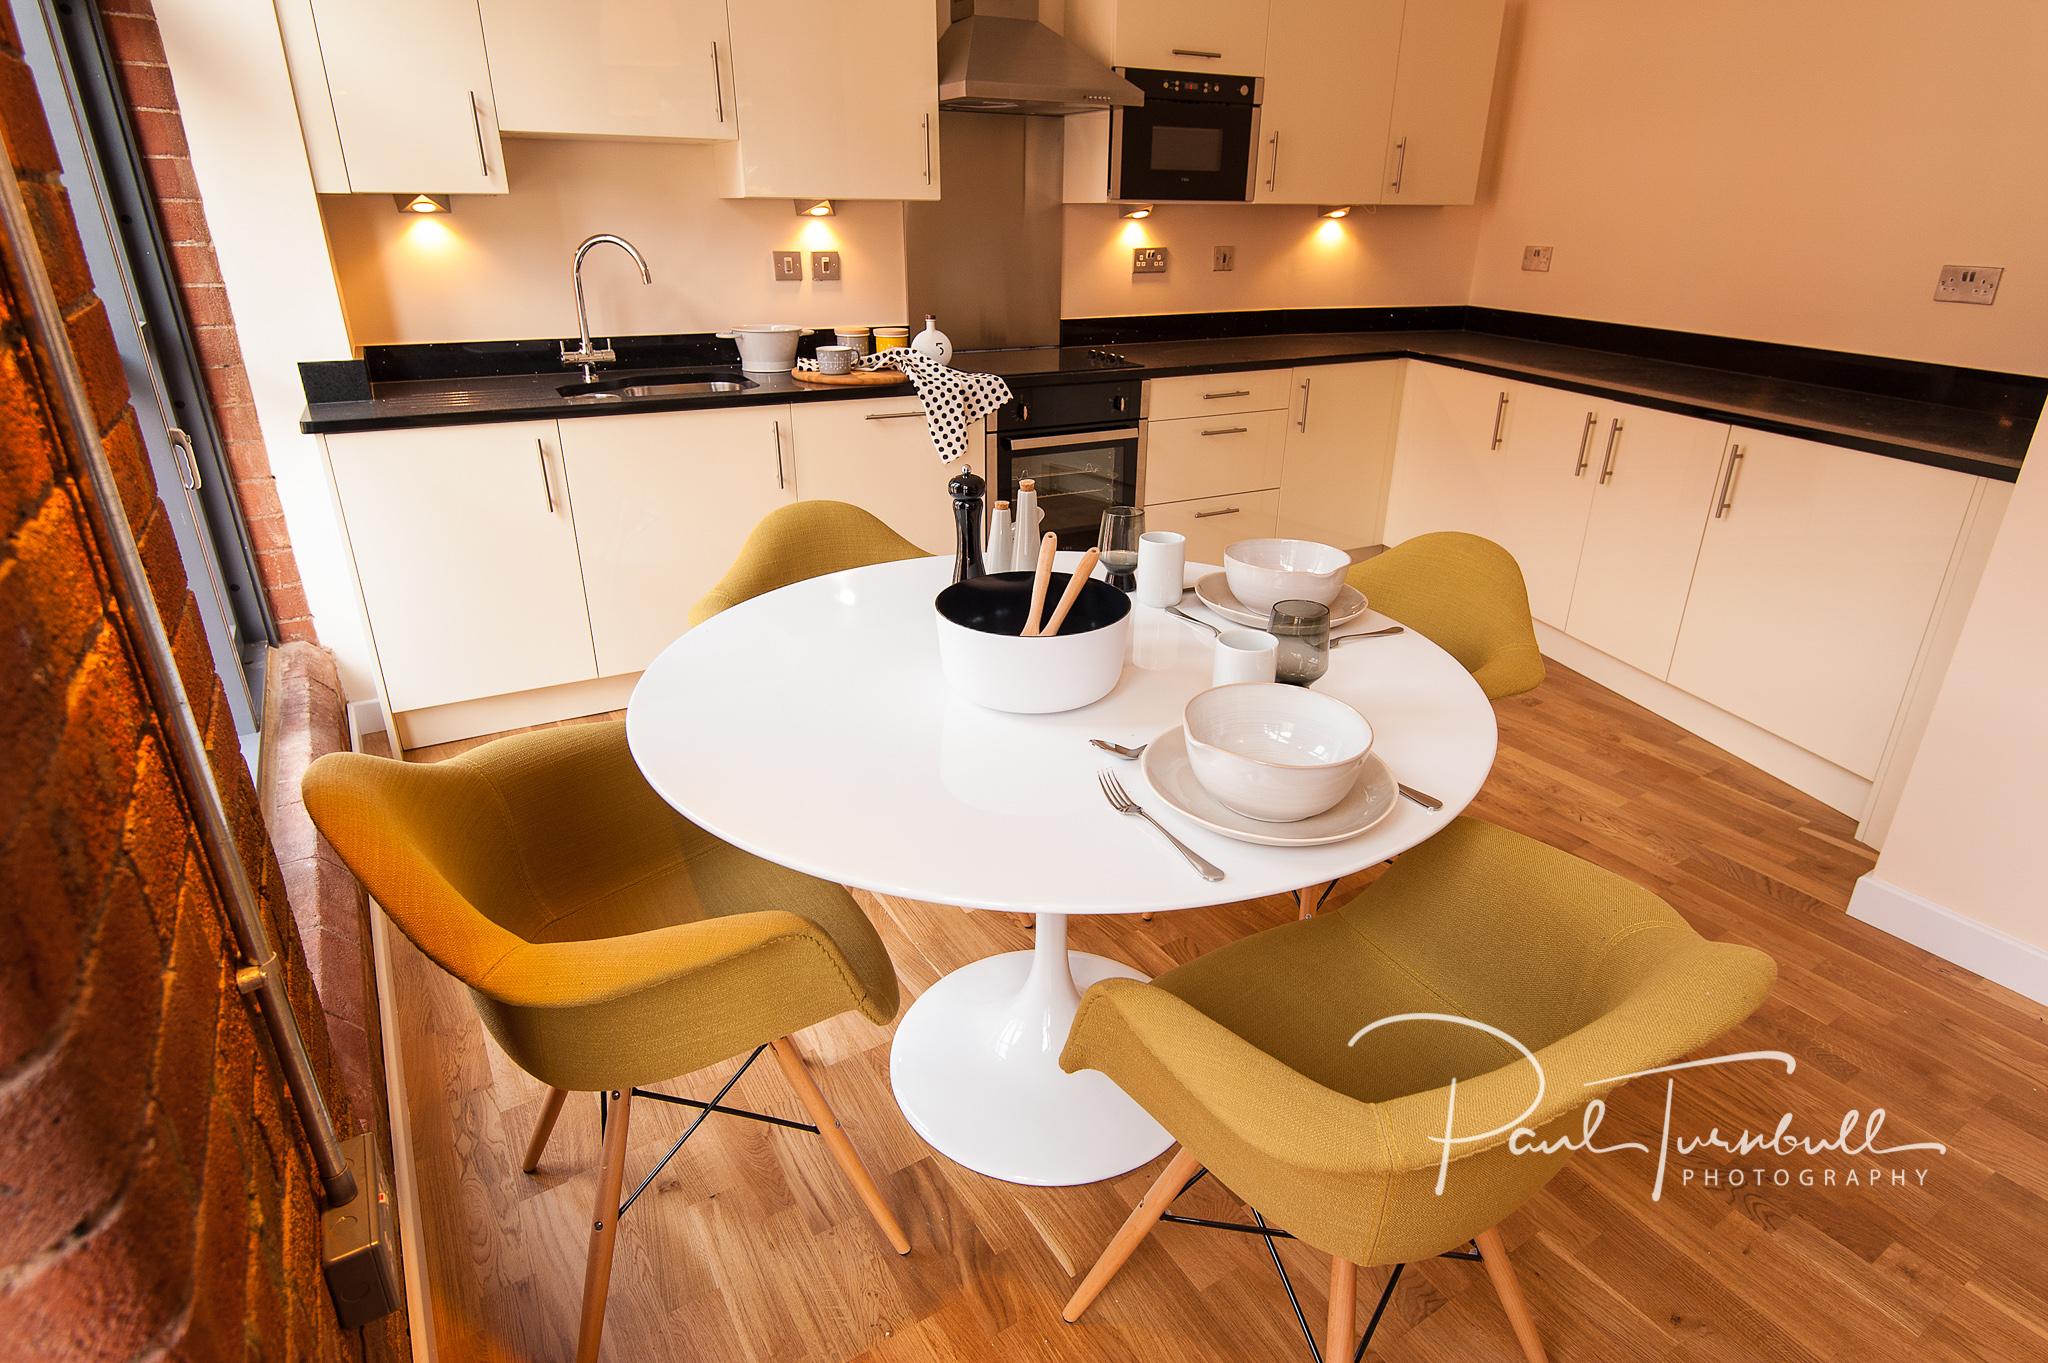 commercial-property-photographer-leeds-yorkshire-blackbrook-developments-049.jpg